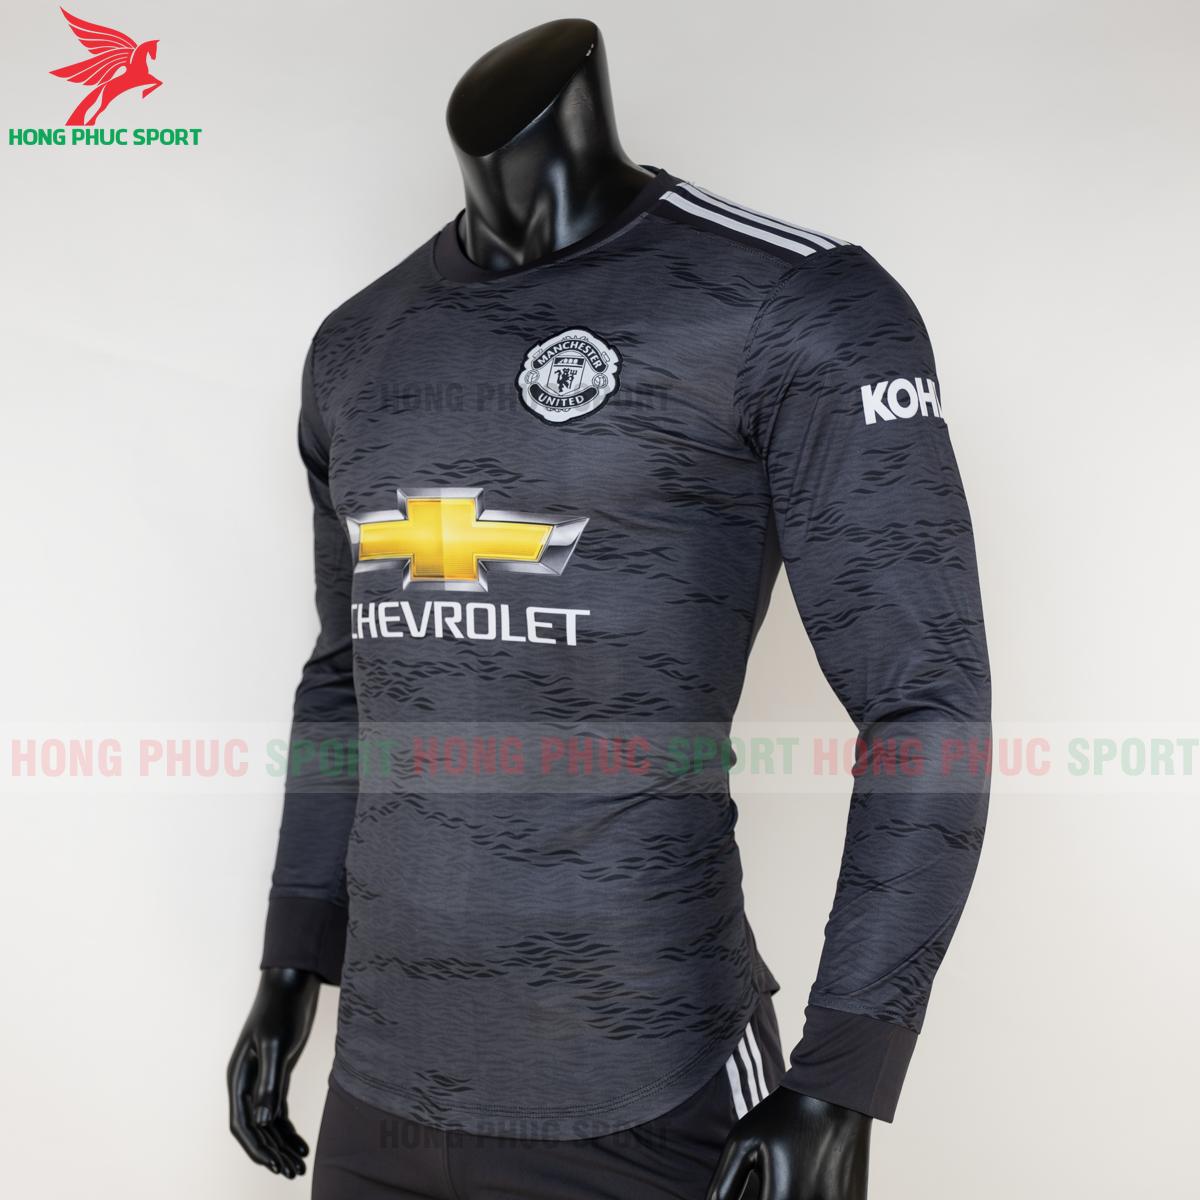 https://cdn.hongphucsport.com/unsafe/s4.shopbay.vn/files/285/ao-dai-tay-manchester-united-2020-san-khach-5-5f8fde22b5834.png